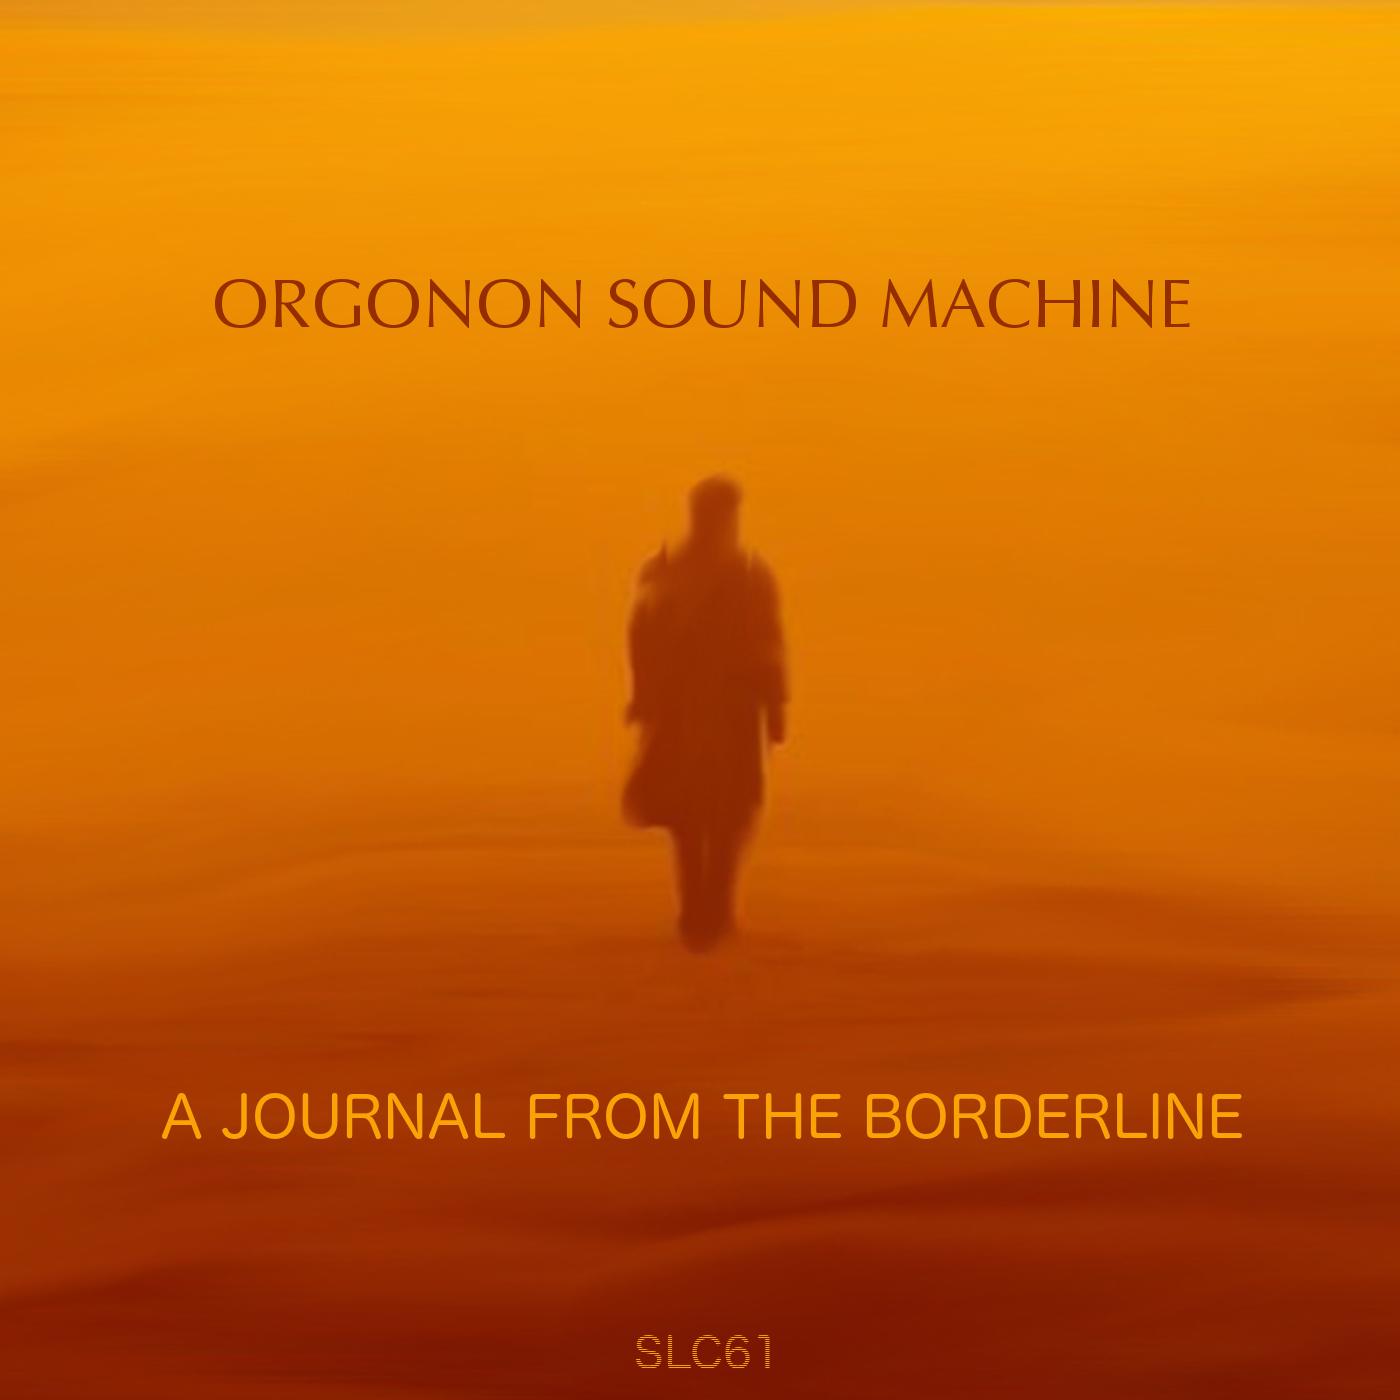 Orgonon Sound Machine – A Journal From The Borderline